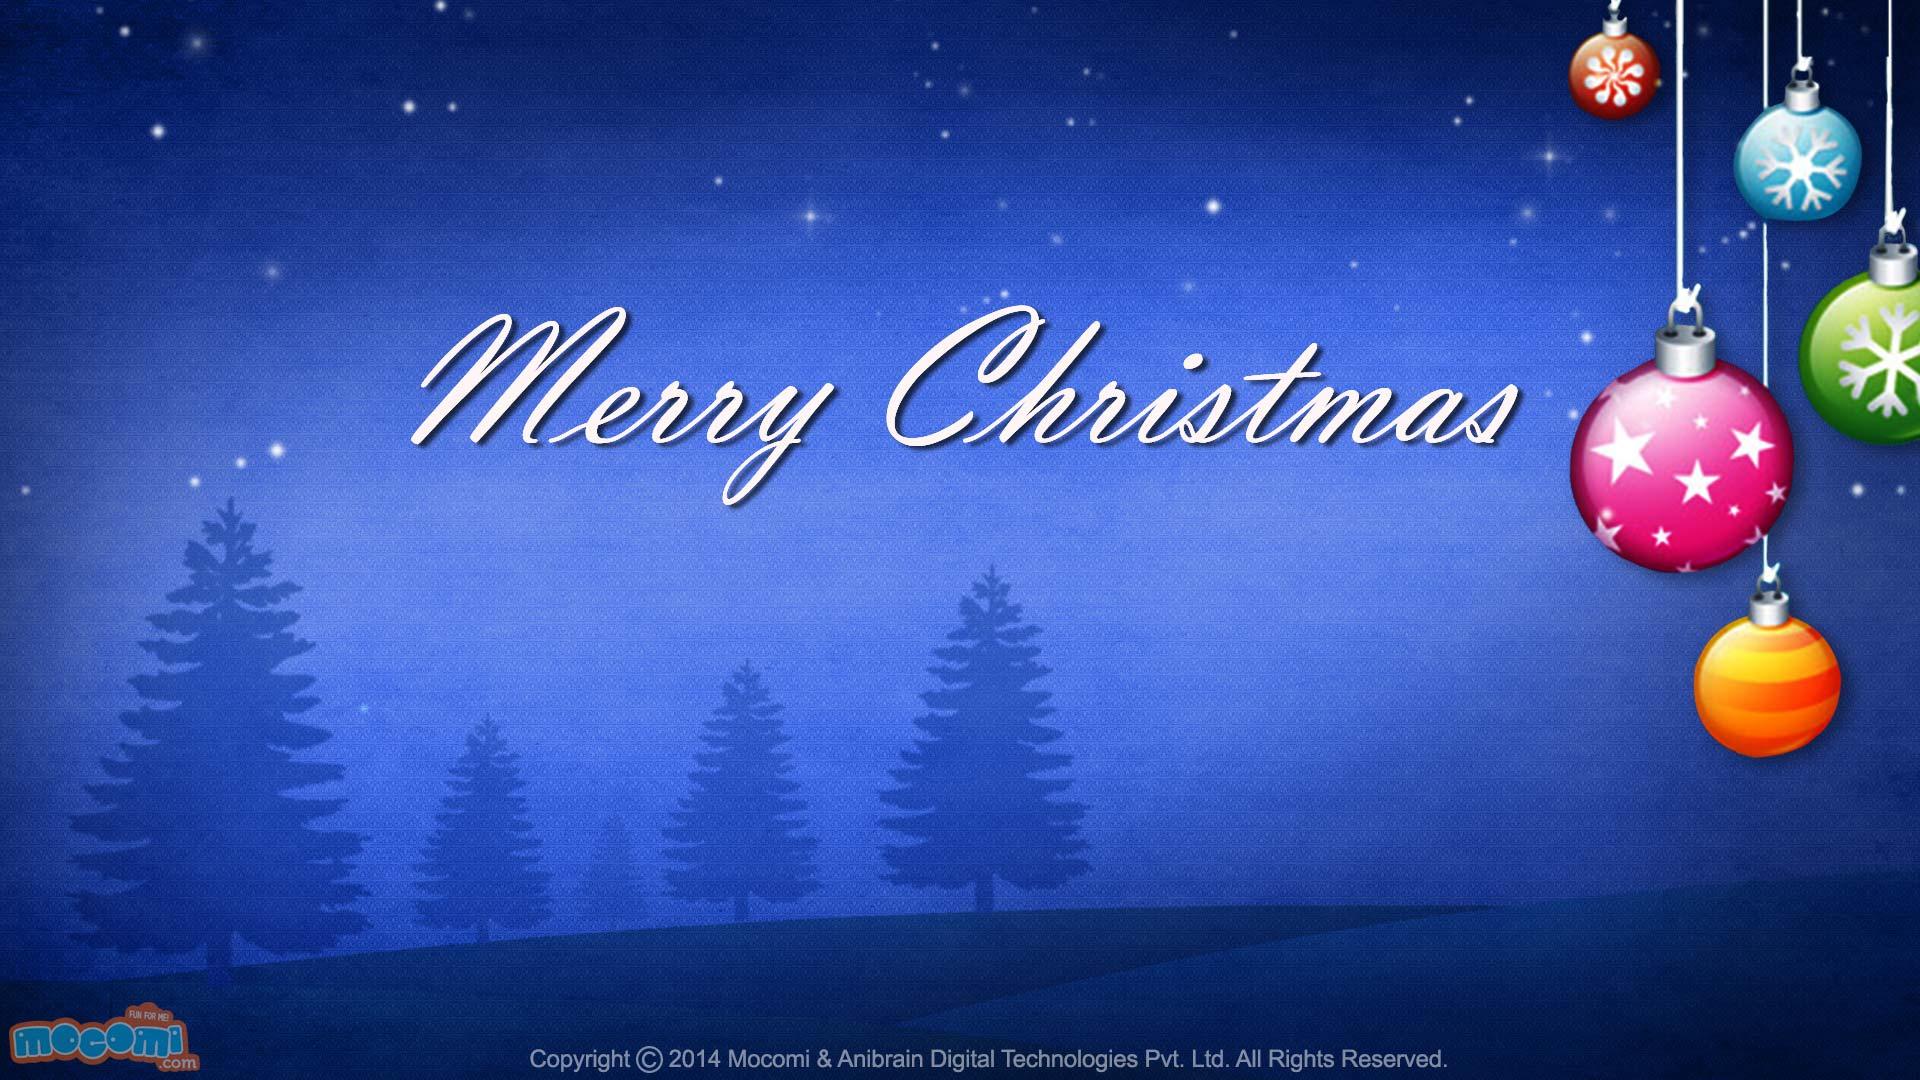 Merry Christmas- Night - Desktop Wallpapers for Kids | Mocomi